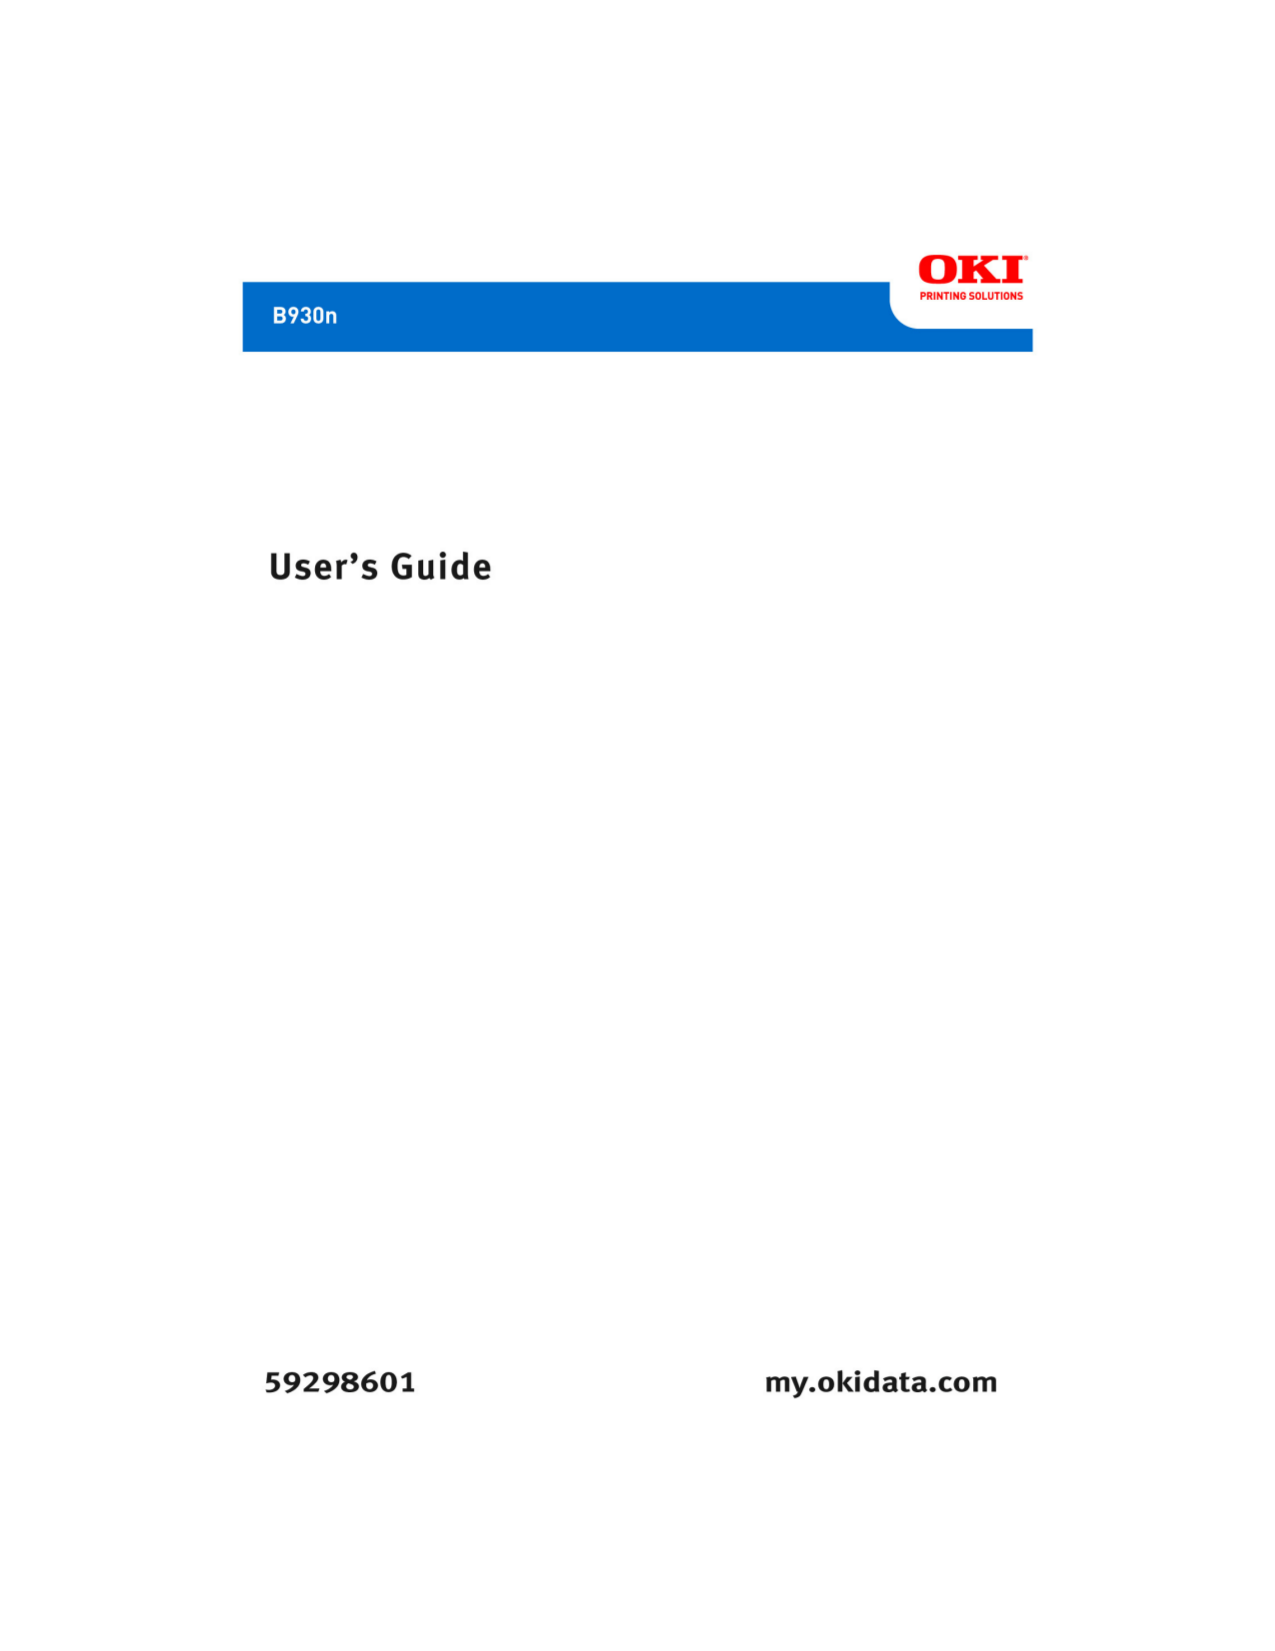 how to print locked pdf